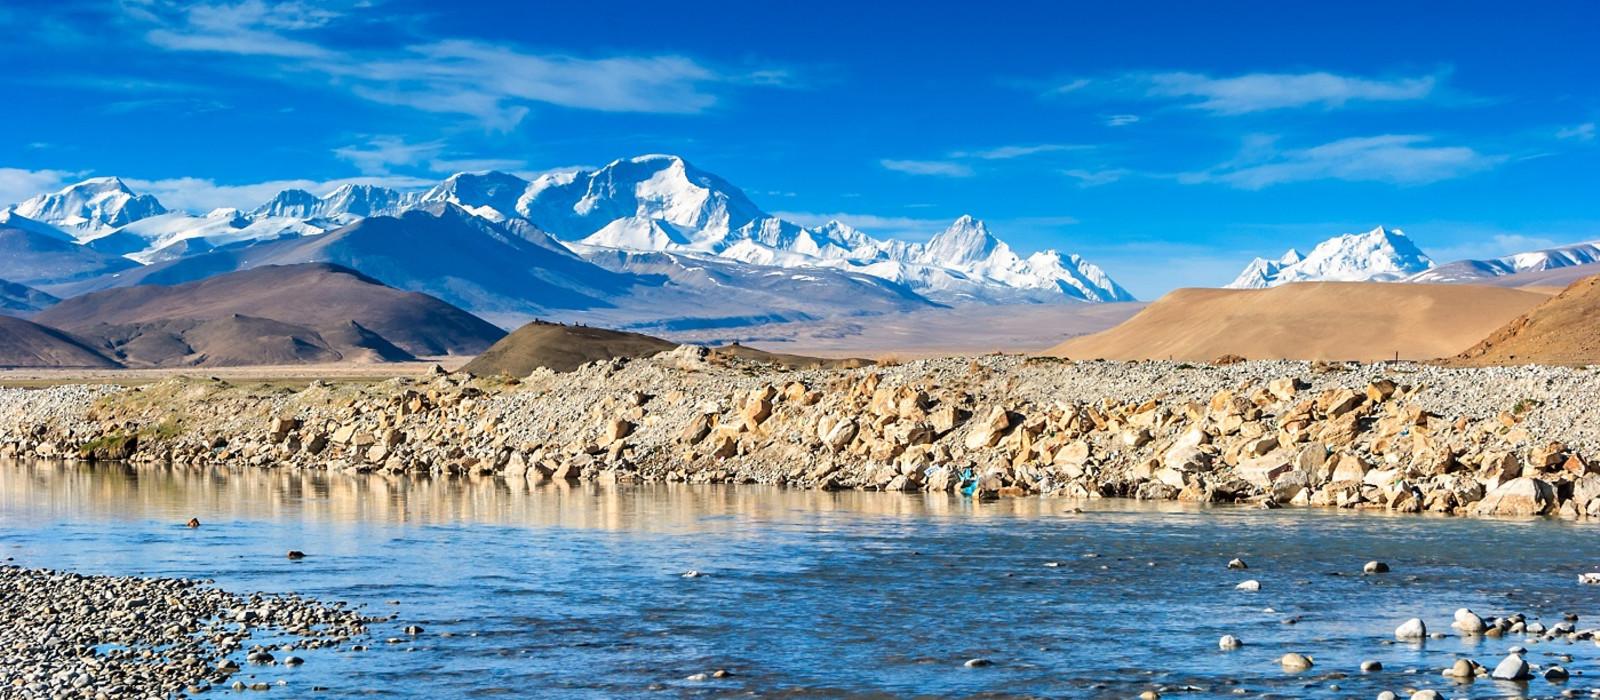 Reiseziel Mount Everest Tibet